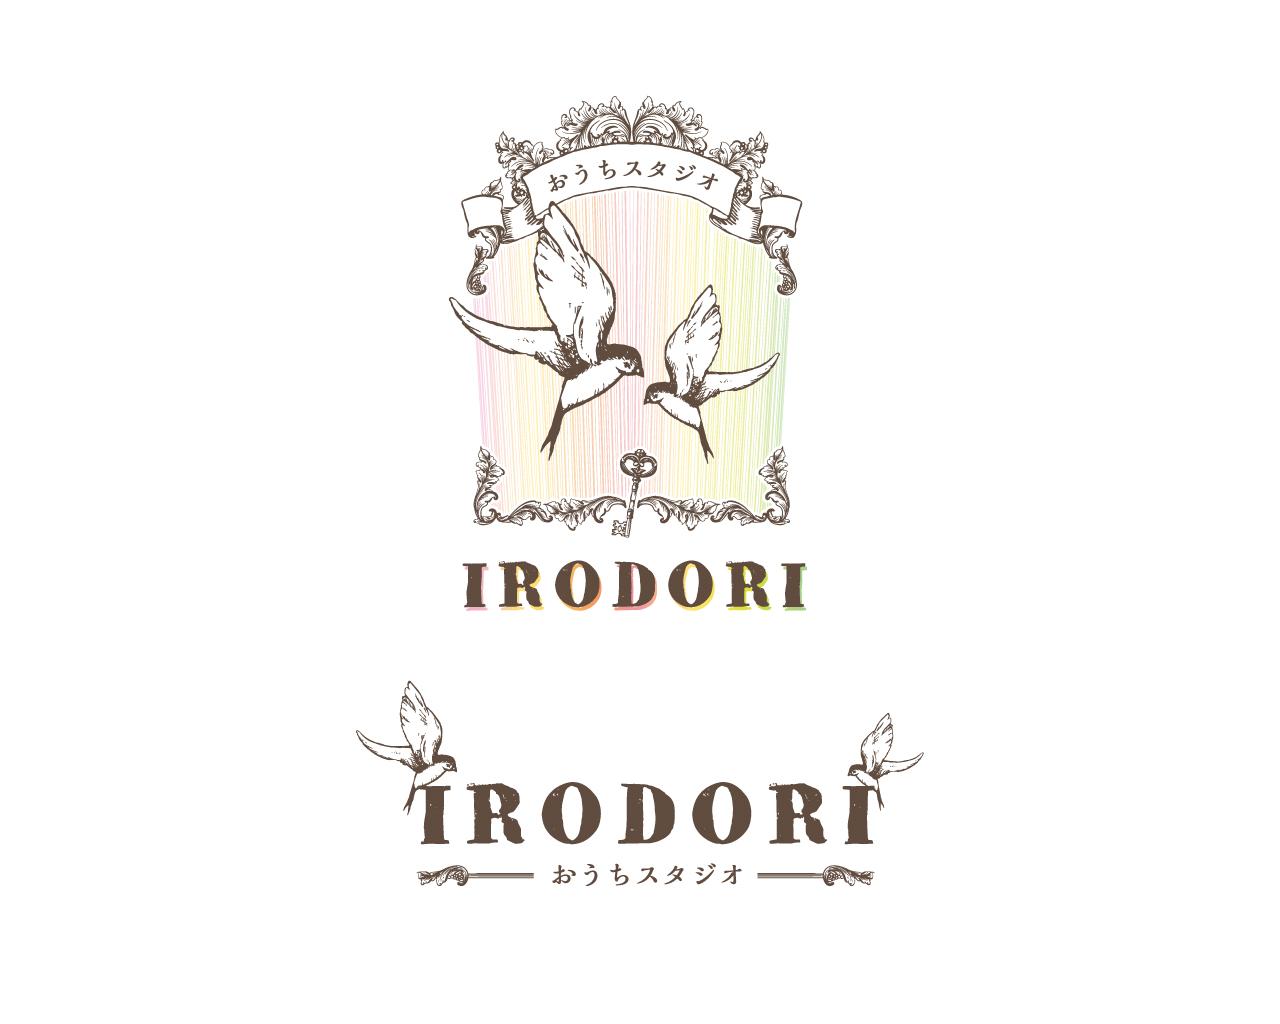 IRODORI様(明日の株式会社様)